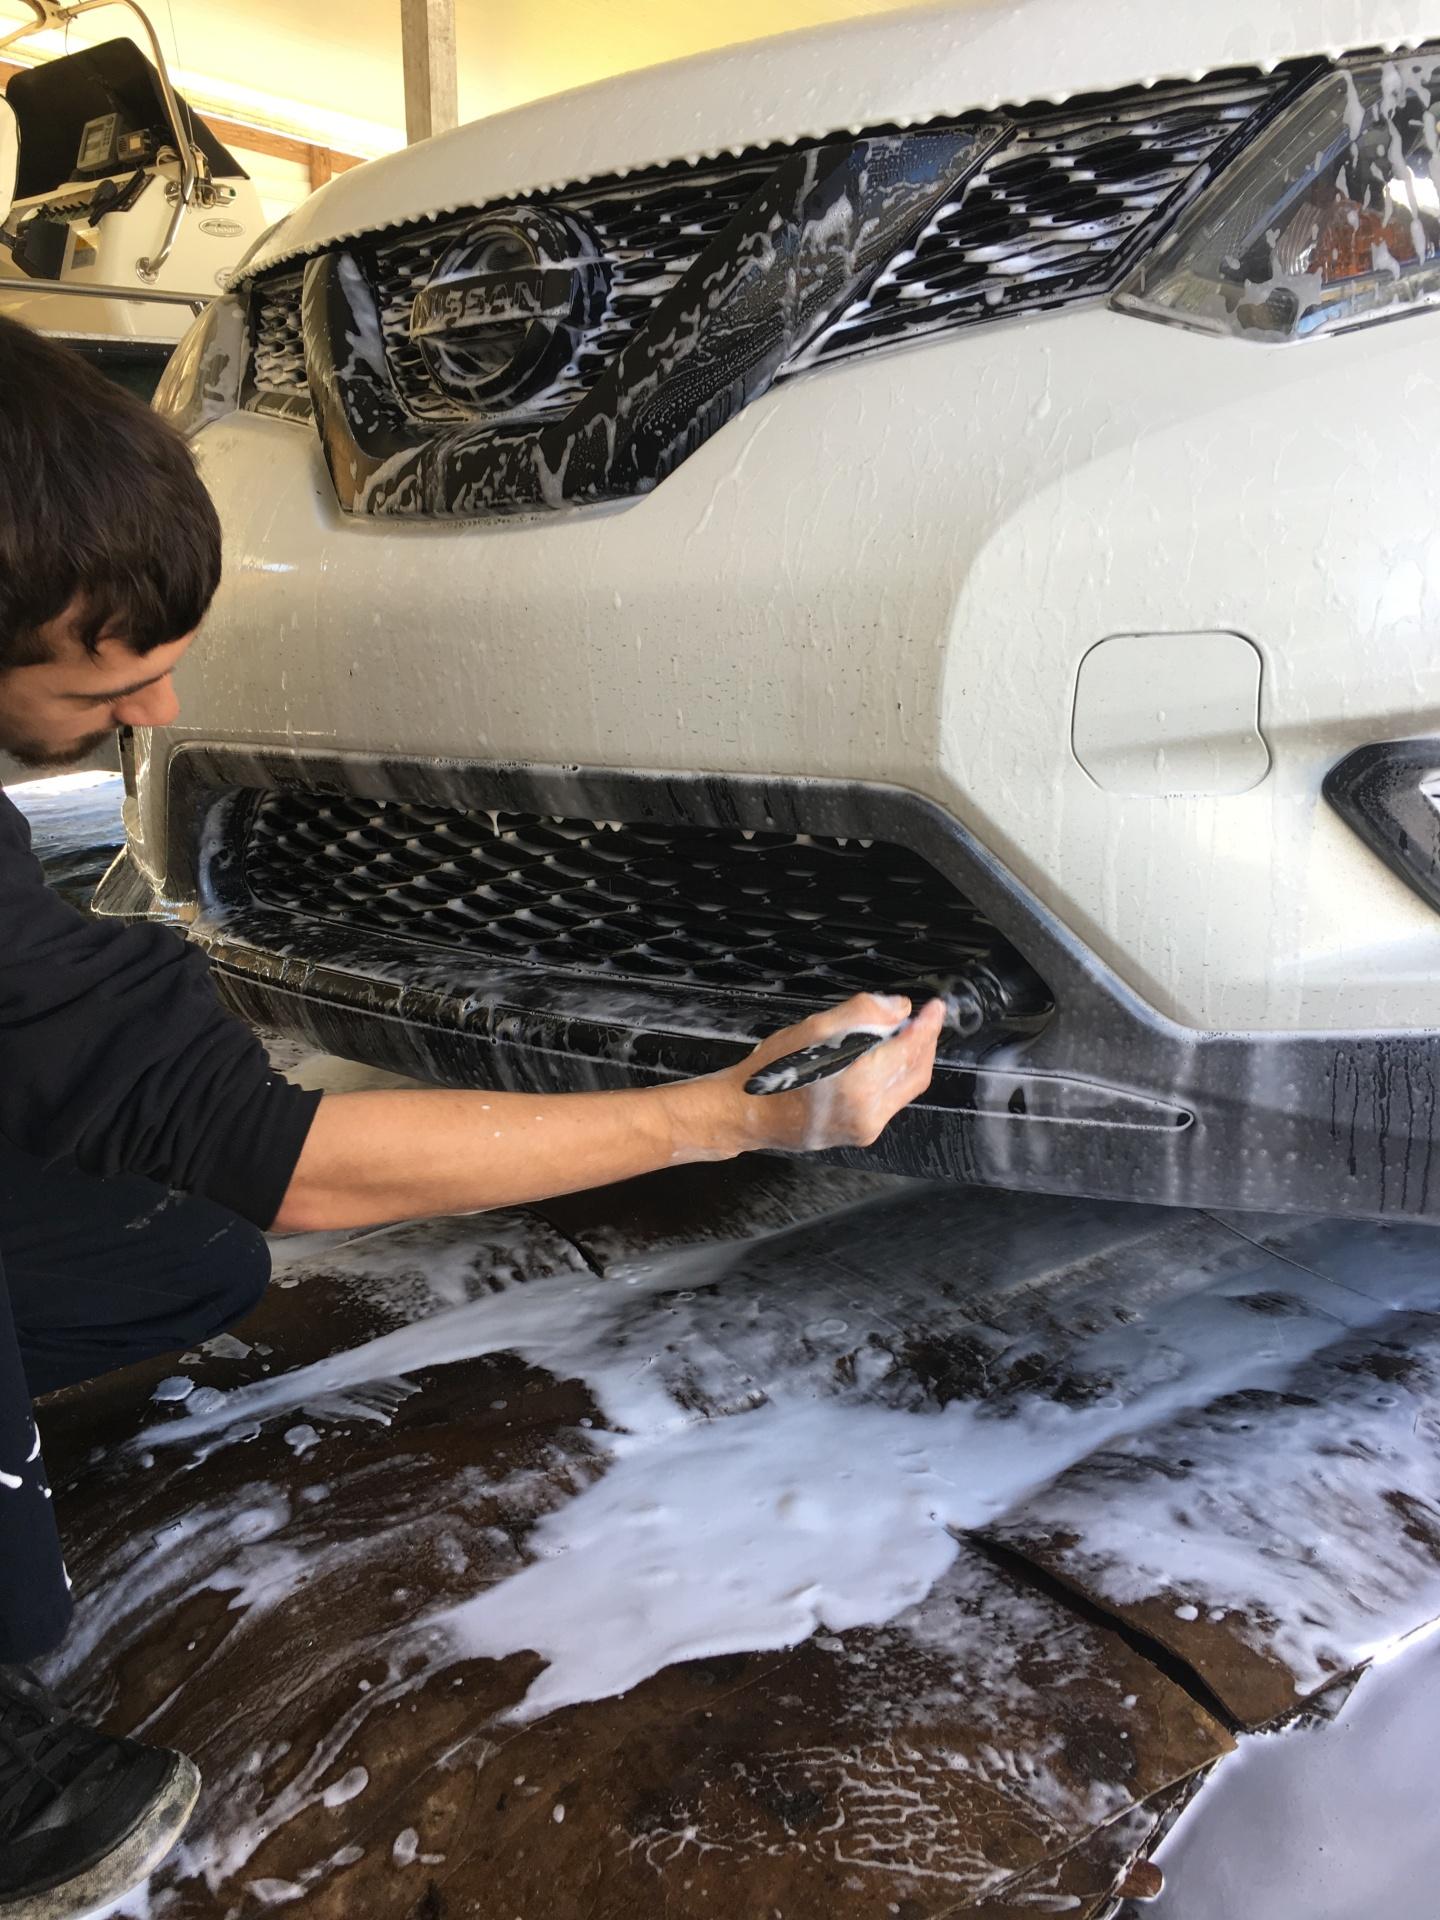 wash, paint decon and 6 month paint sealant